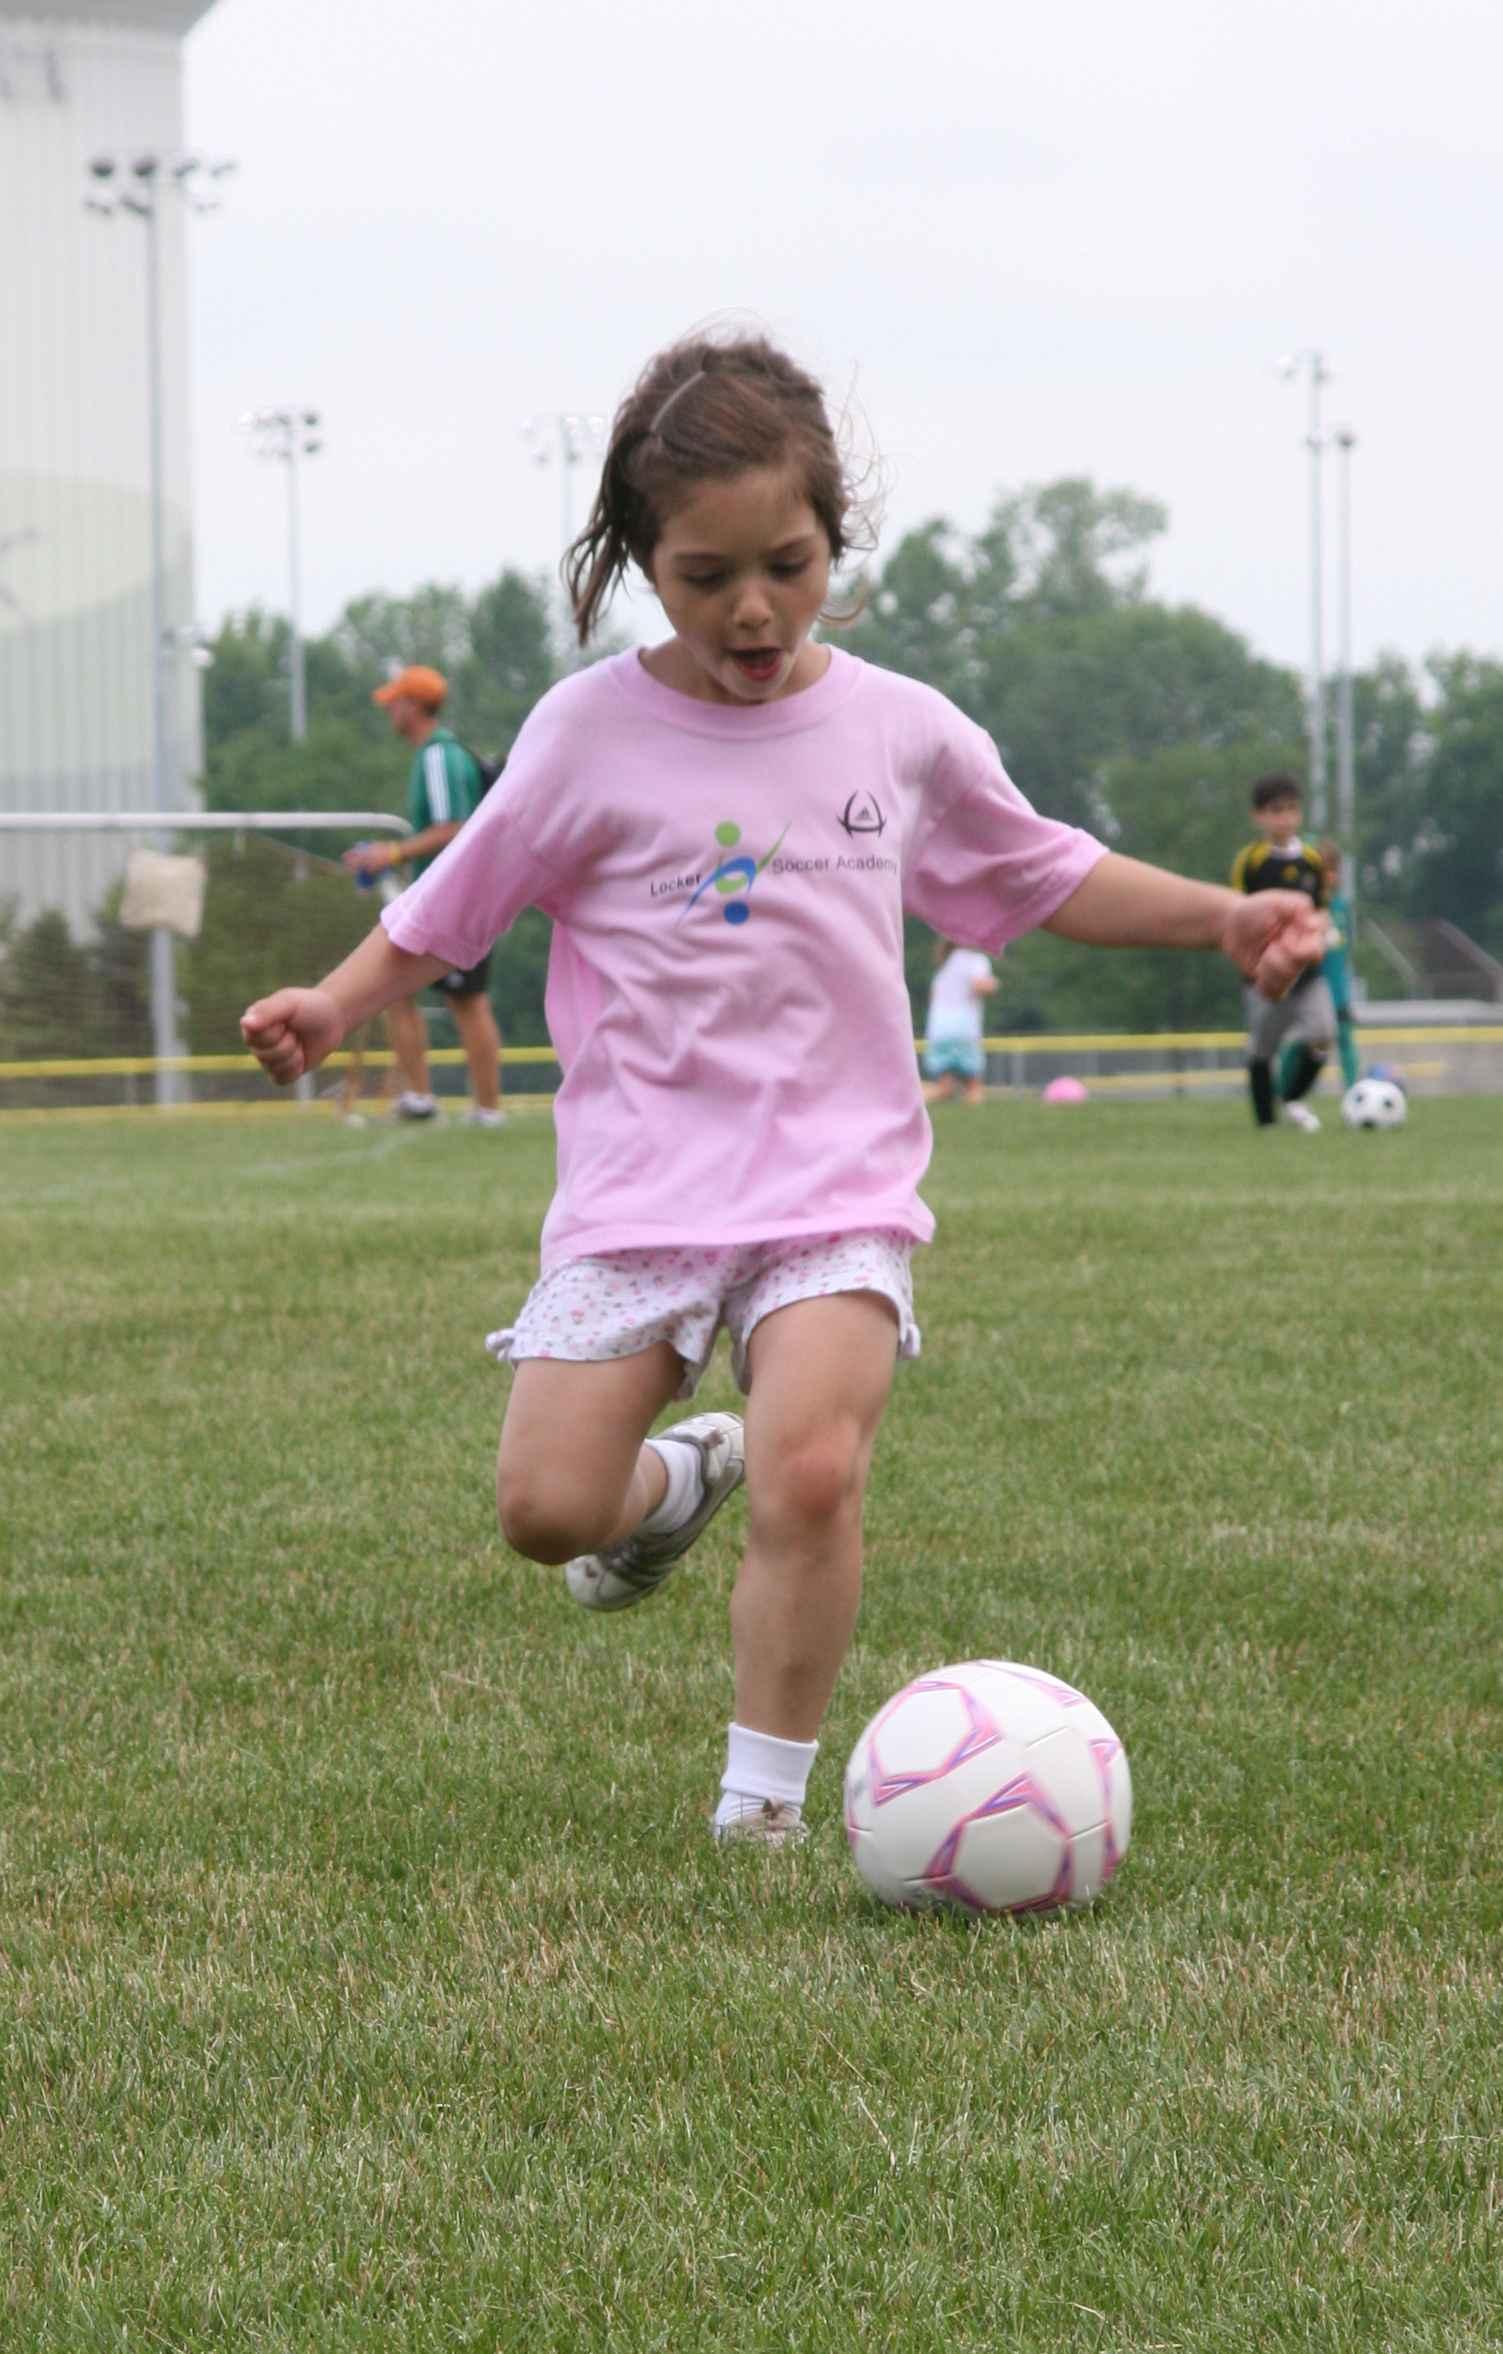 leah_soccer_face_edit_sm